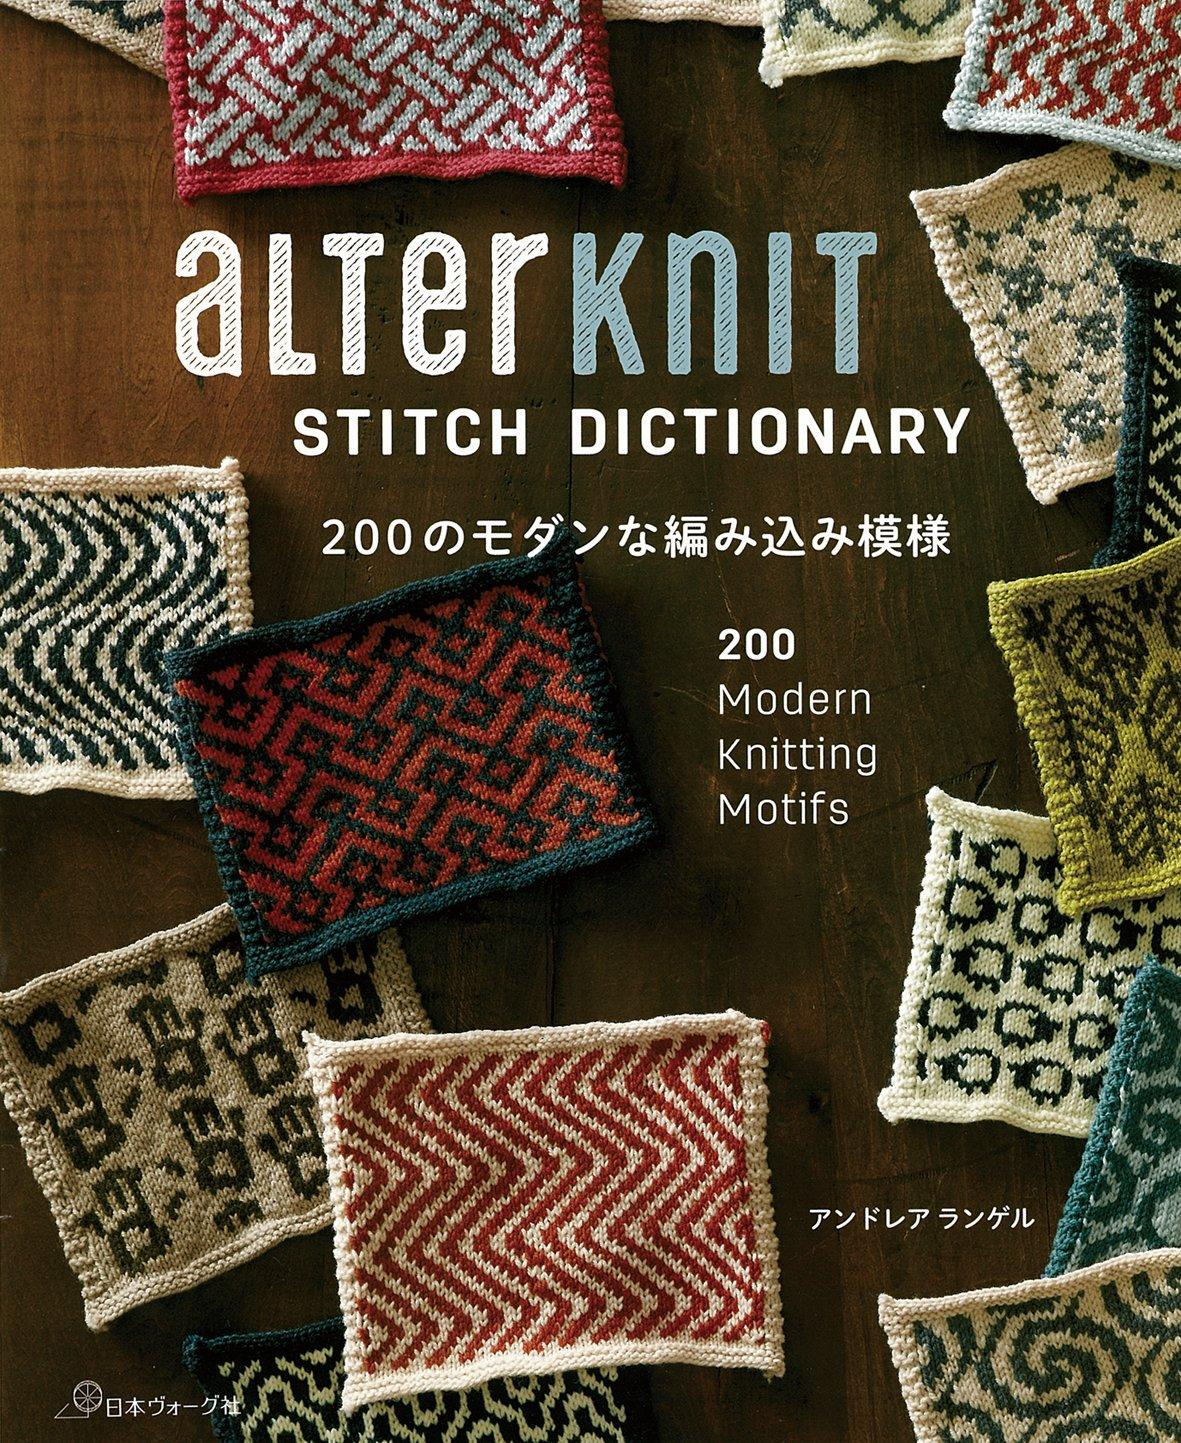 Modern weave pattern of ALTERKNIT STITCH DICTIONARY 200 Andrea Rangel